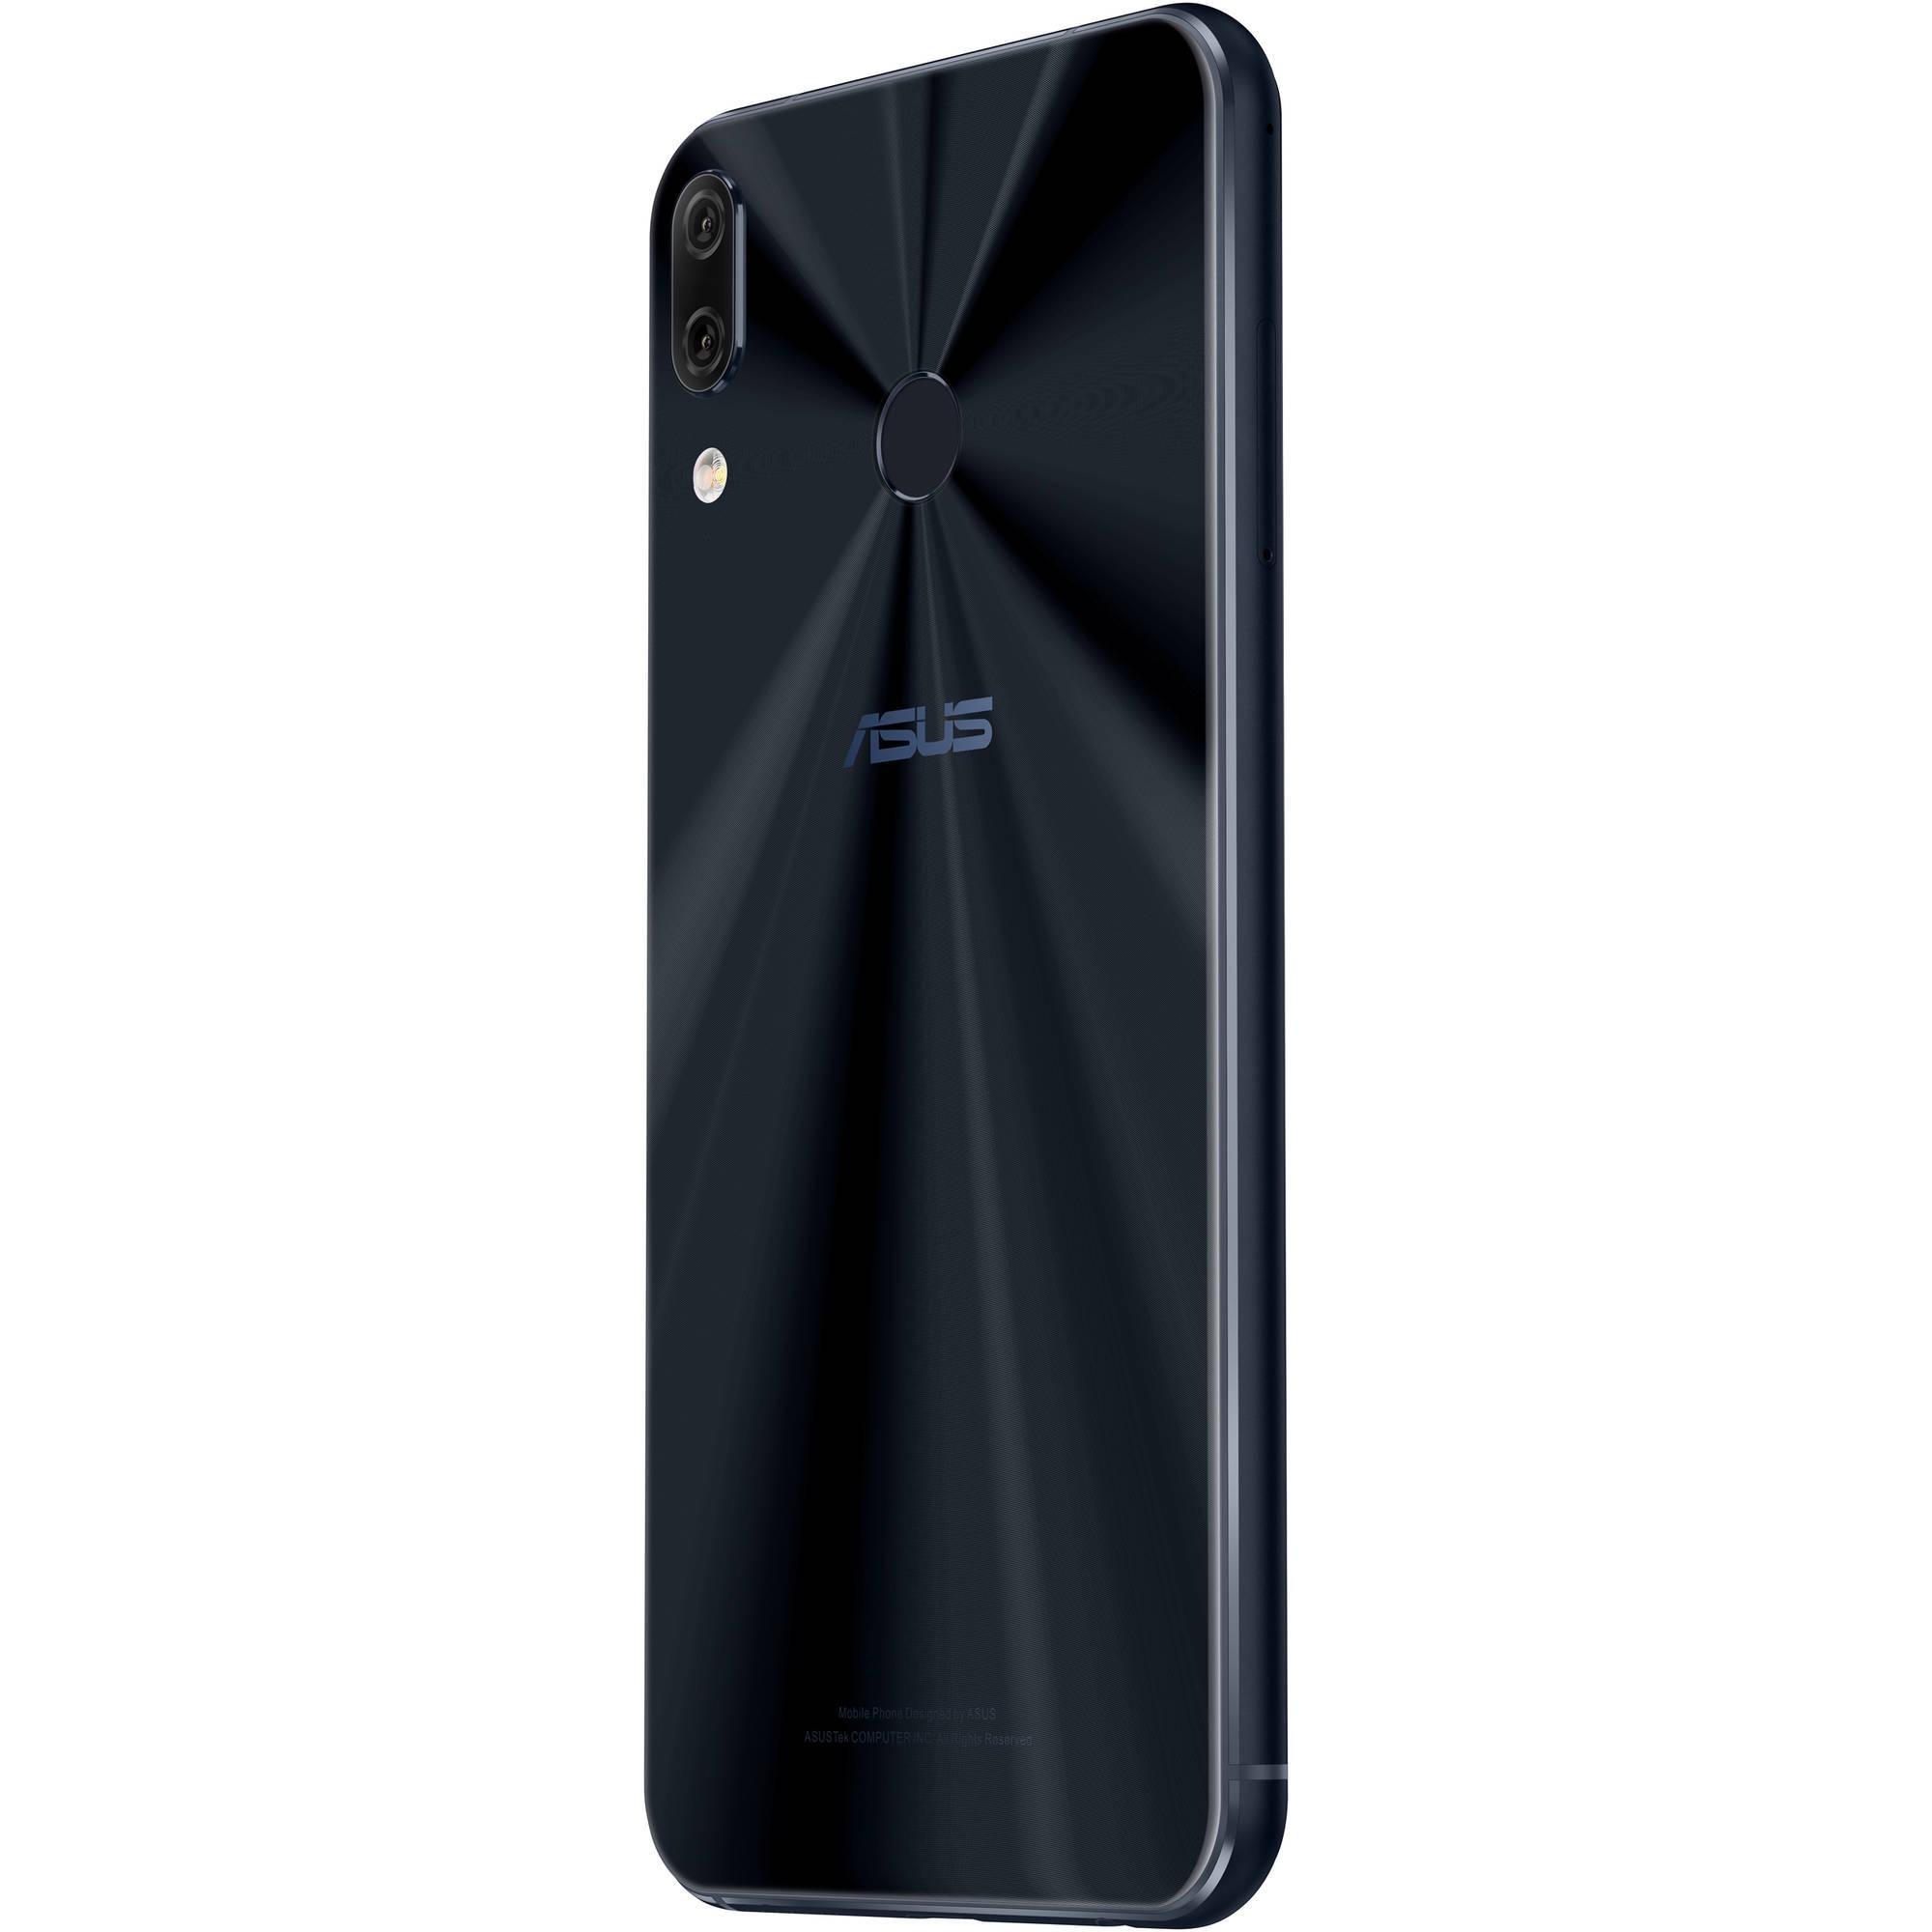 ASUS ZenFone 5Z ZS620KL Dual-SIM 64GB Smartphone (Unlocked / Midnight Blue)